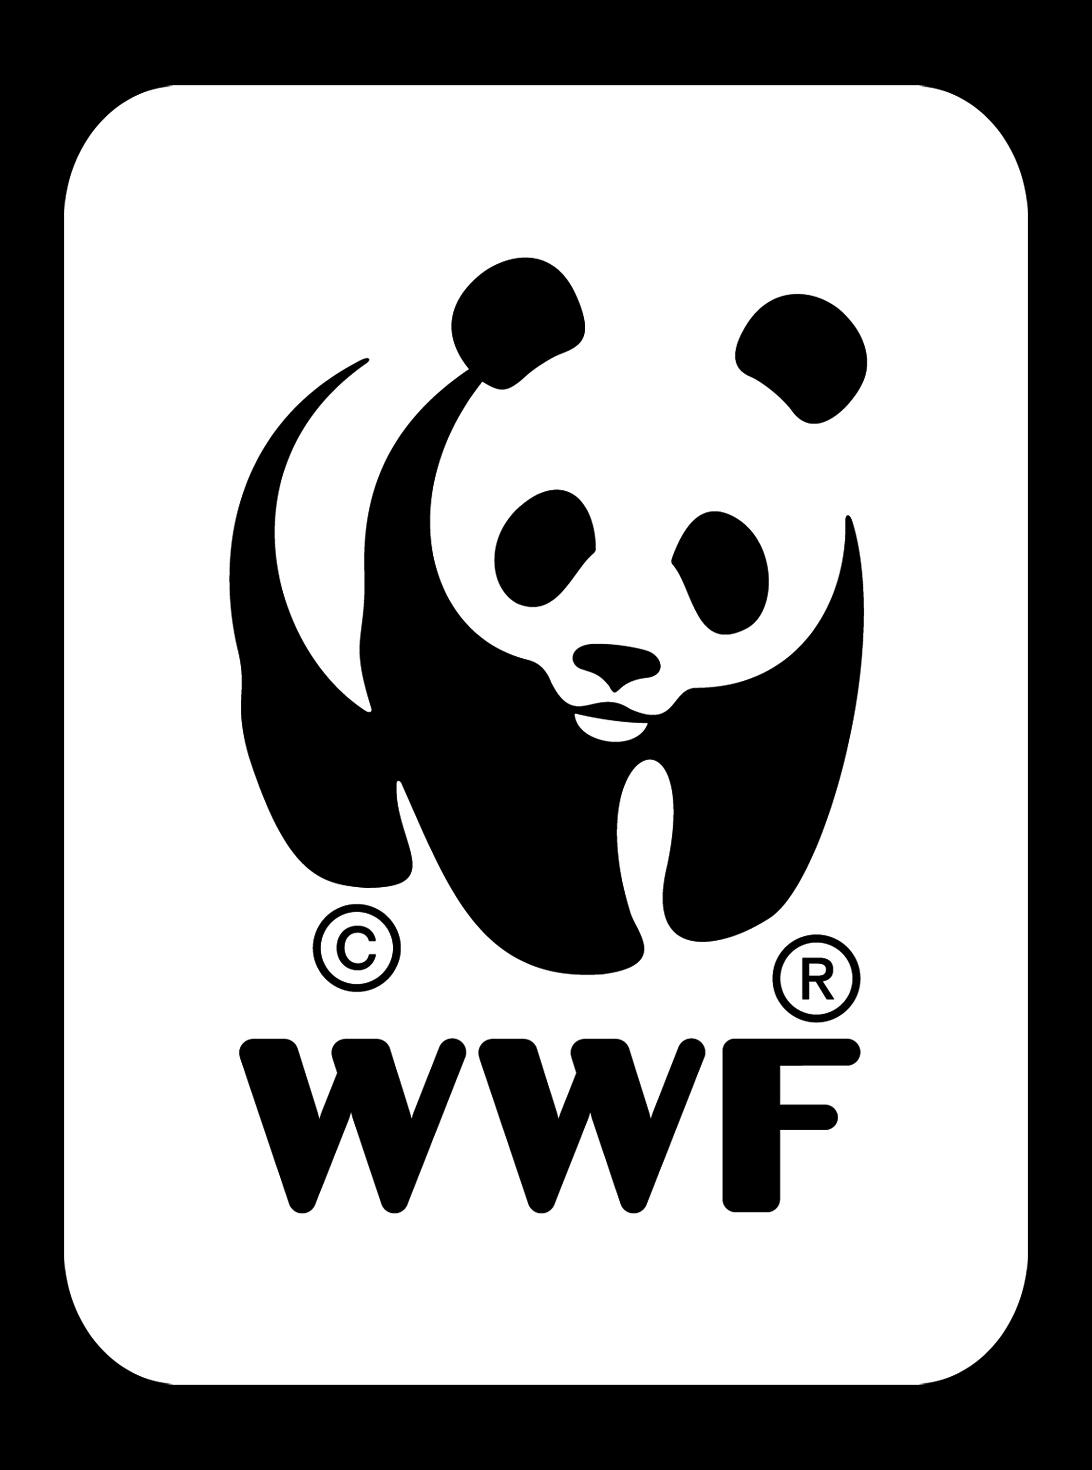 WWF logo (World Wildlife Fund) by Peter Scott (UK) u2013 logo panda - Wwf Logo Vector PNG